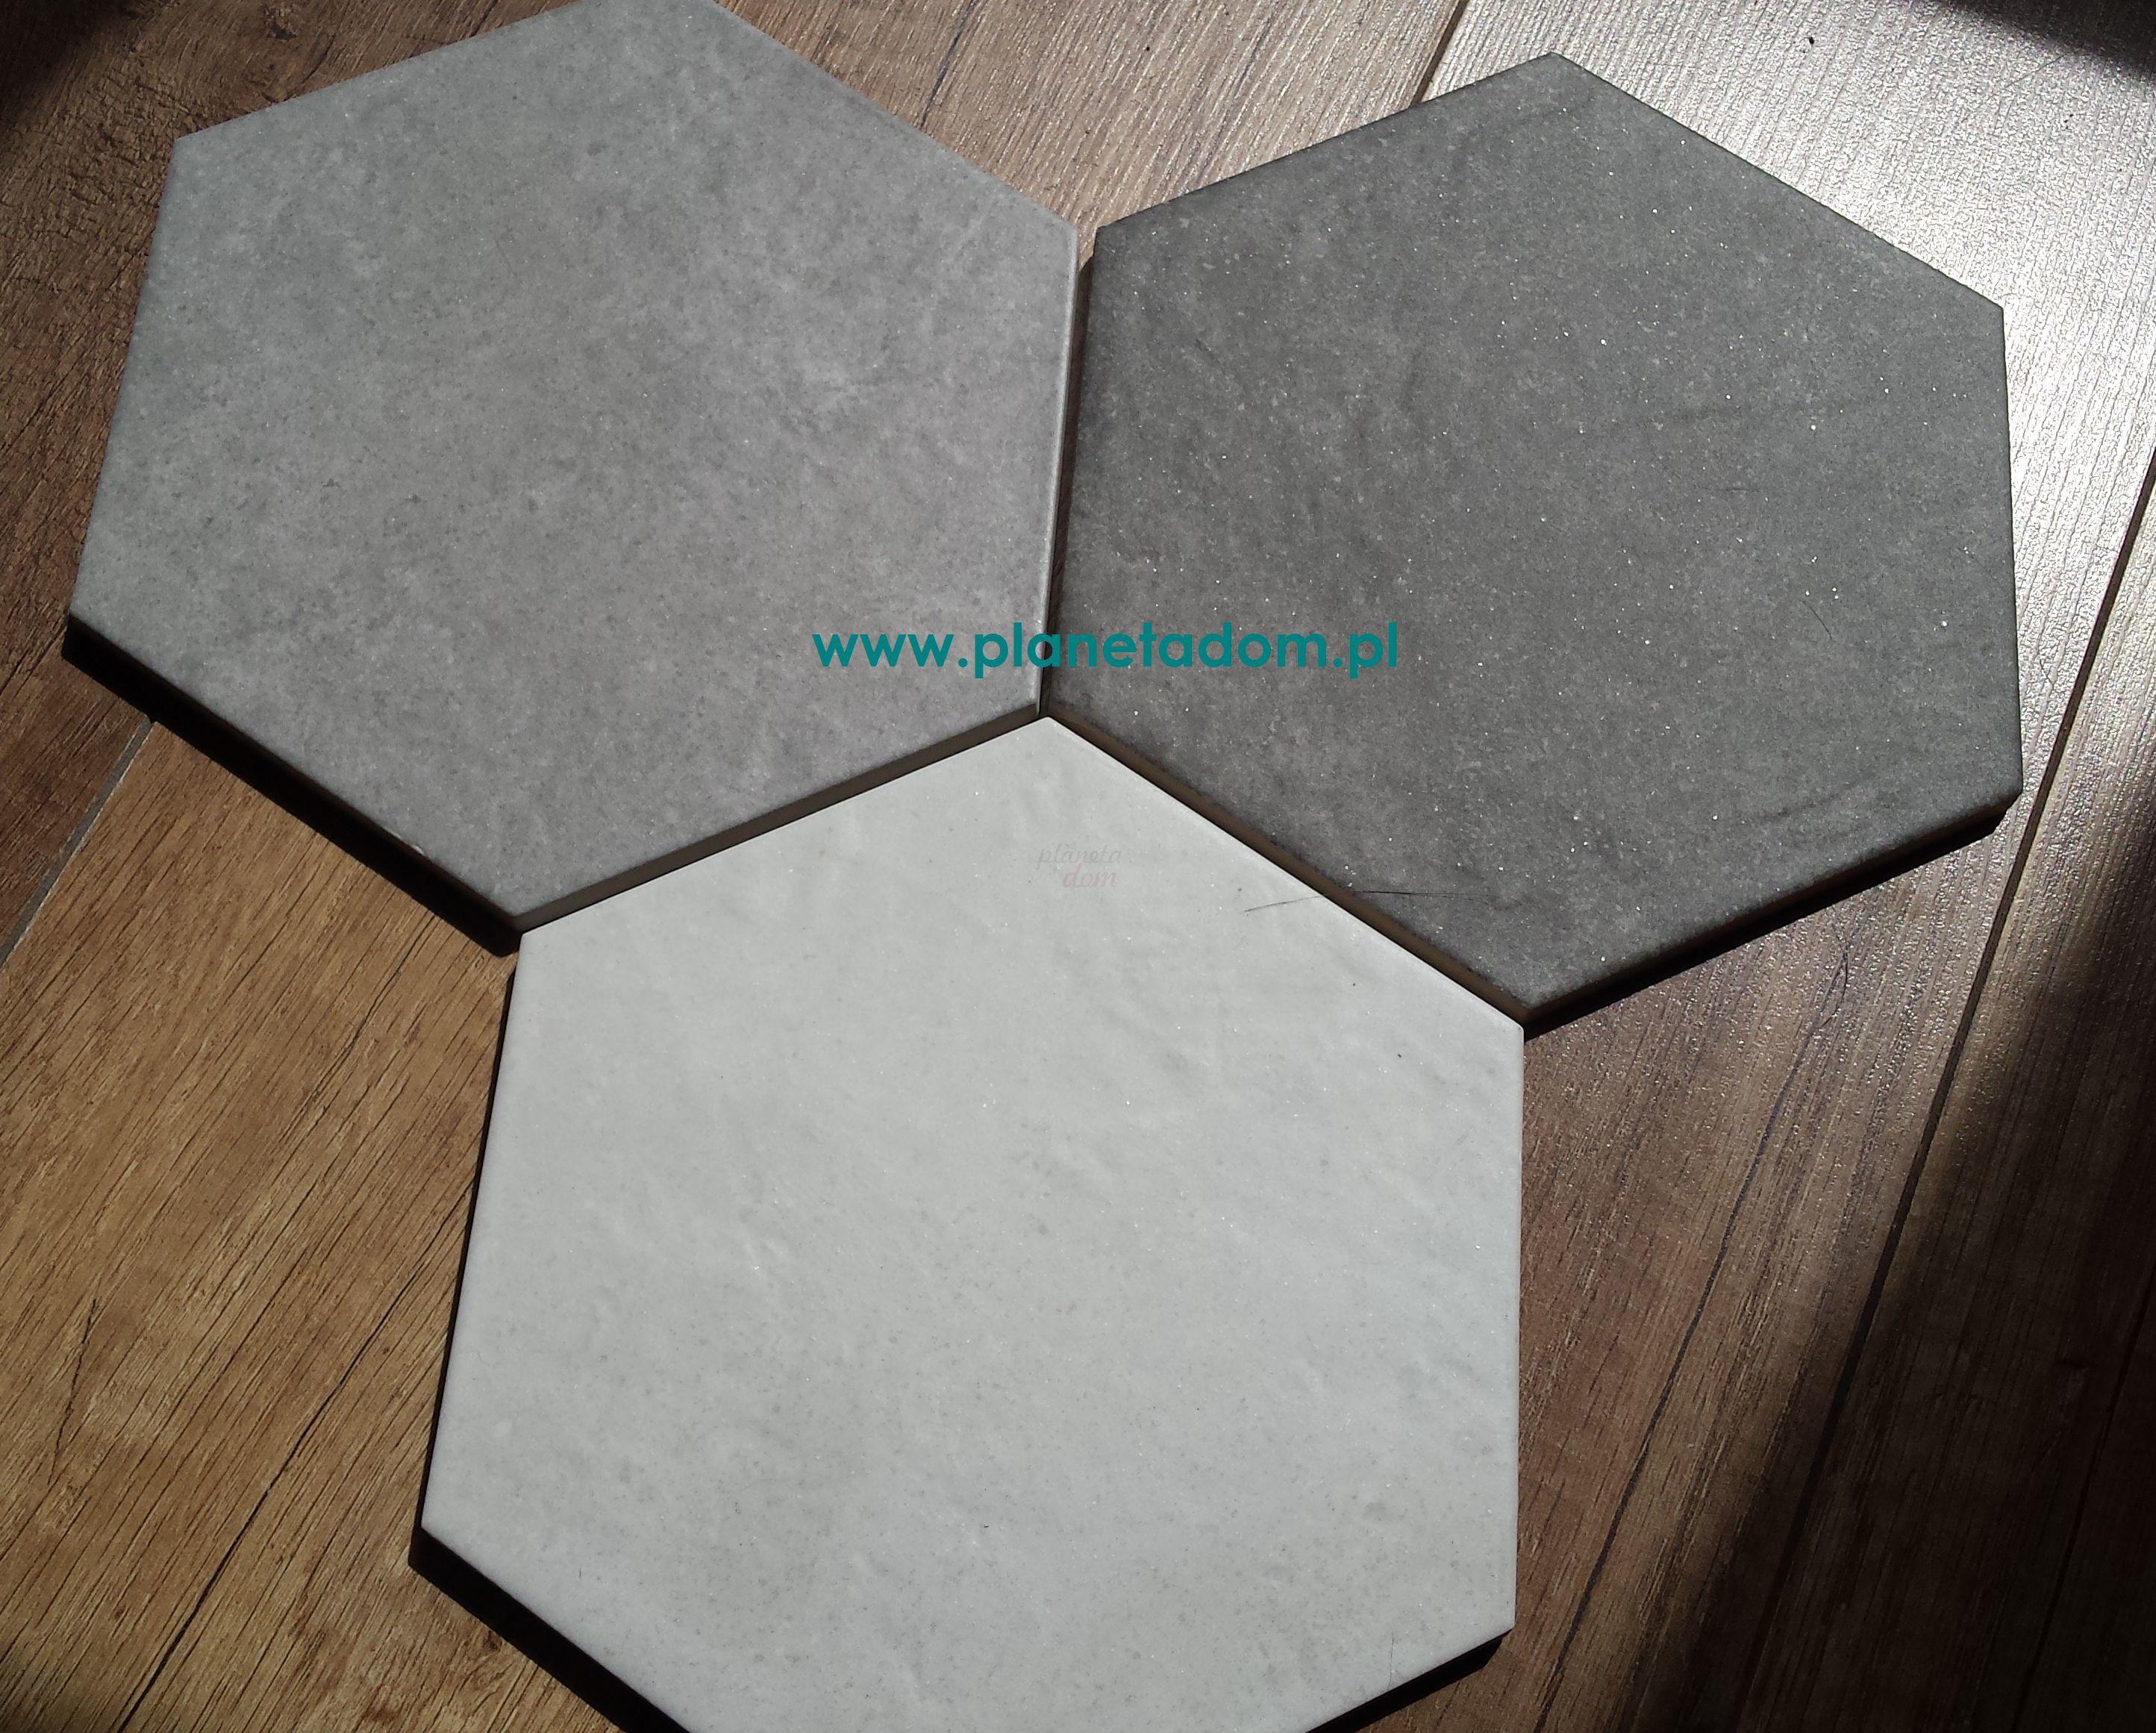 Equipe - Hexatile Cement White 17,5x20   Boden